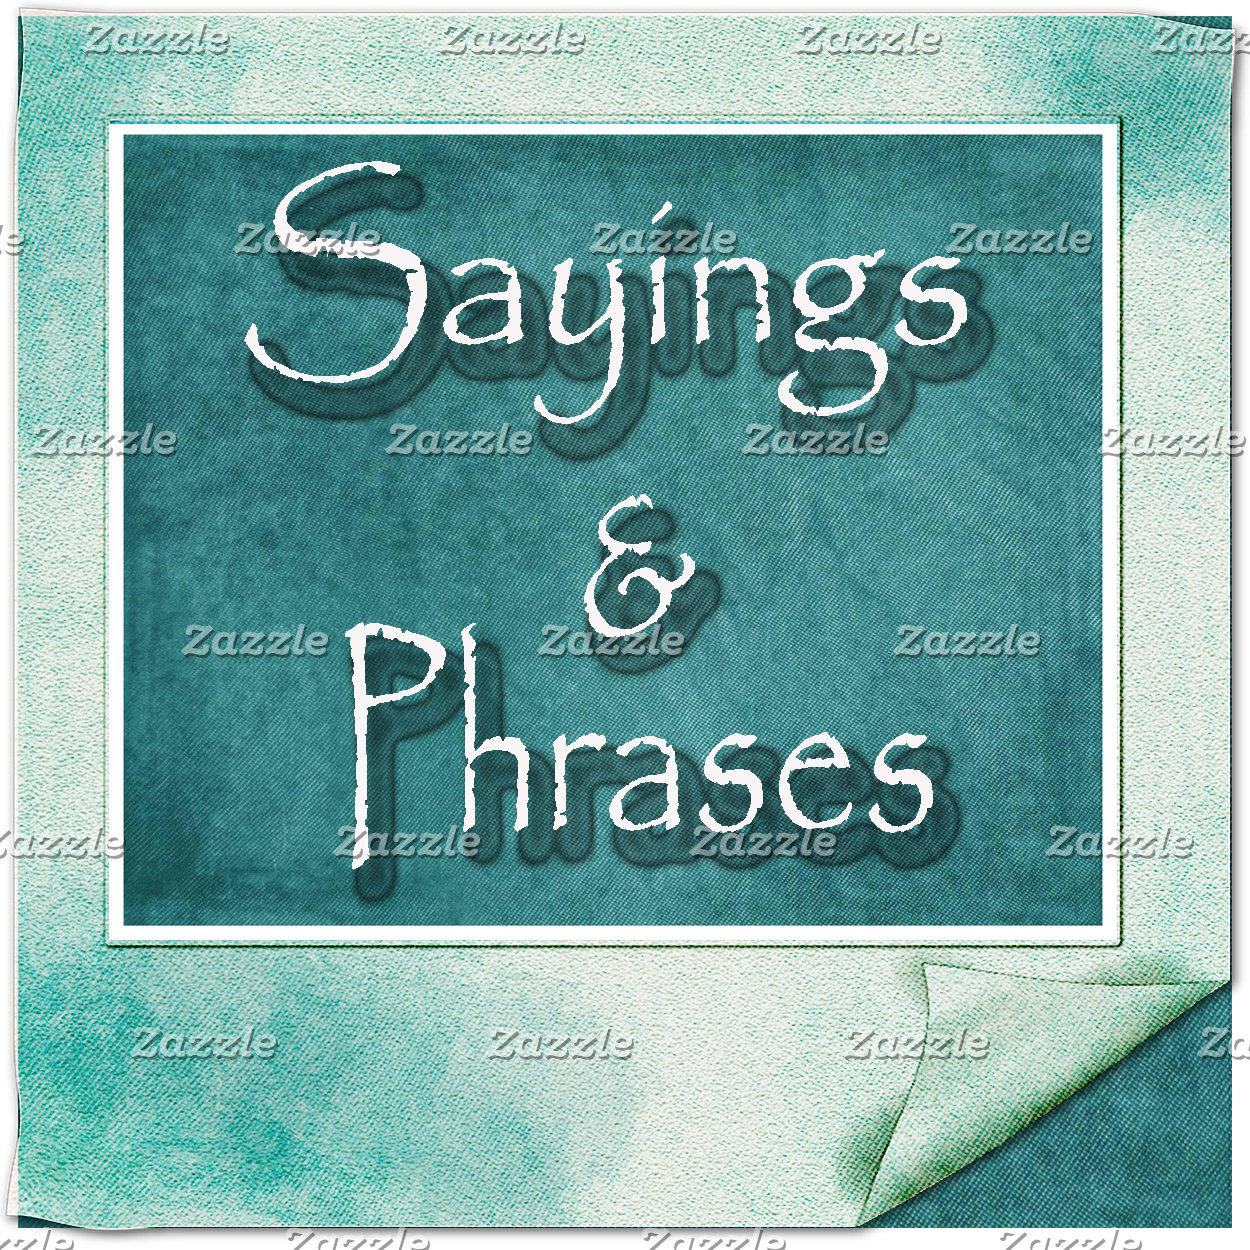 Sayings / Phrases